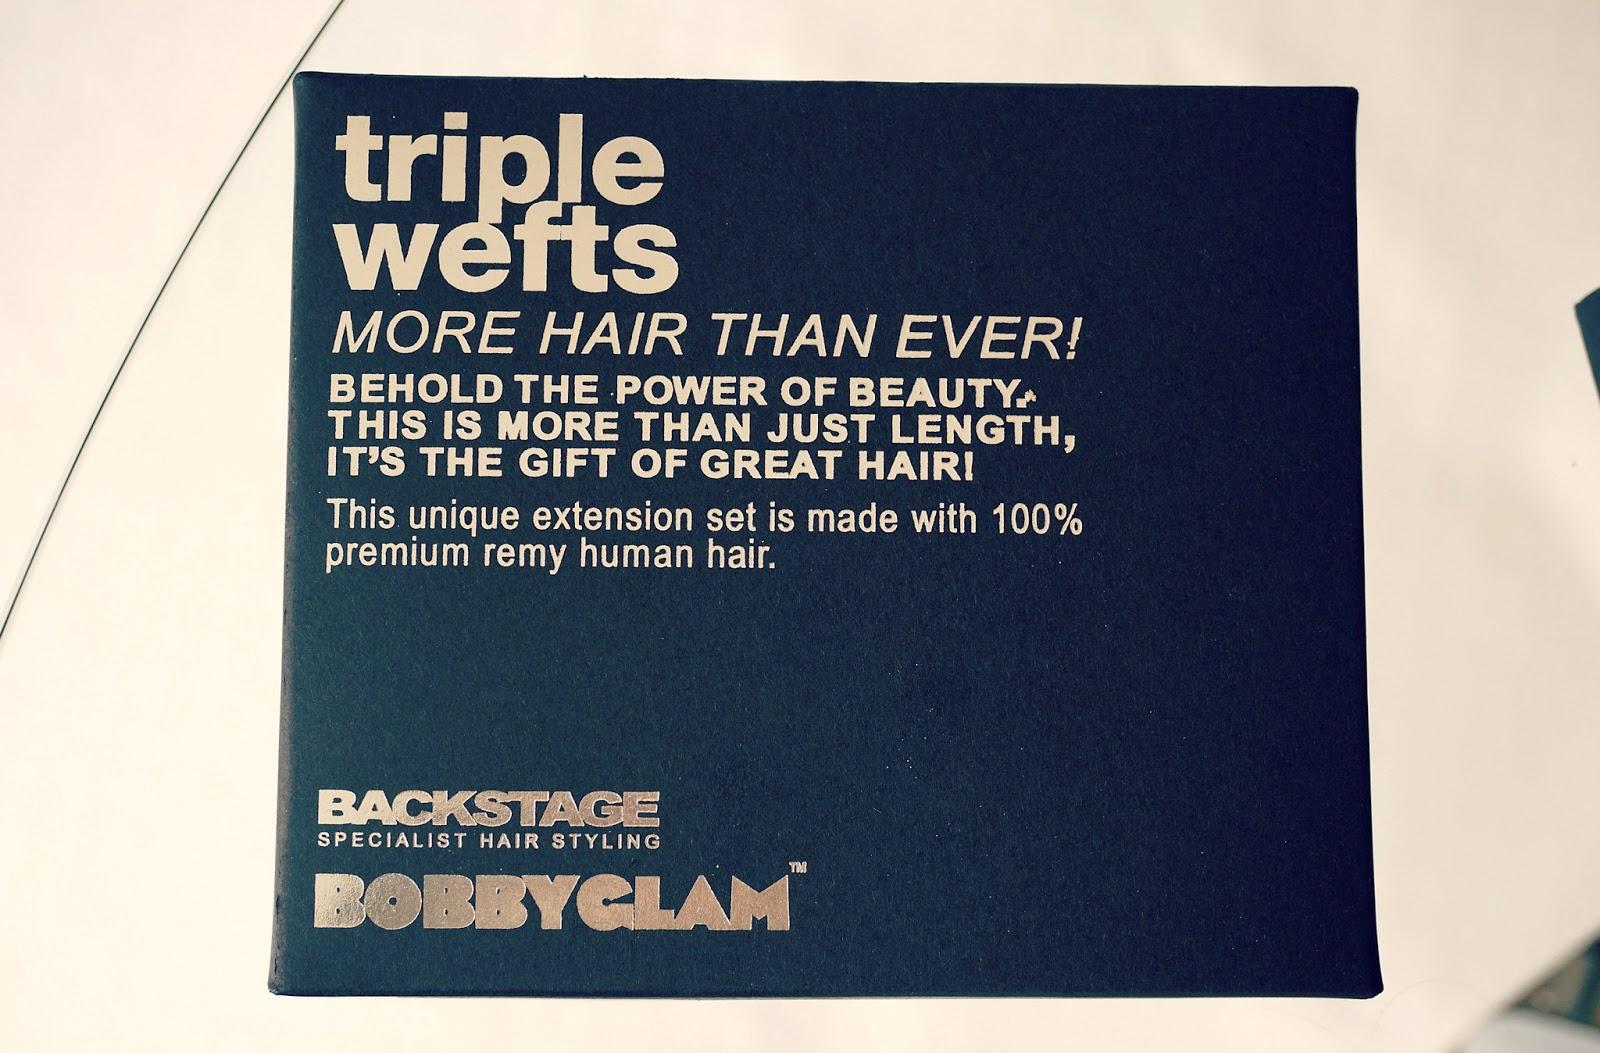 Bobbyglam Hair Extensions Review Tutorial Fashion Camera